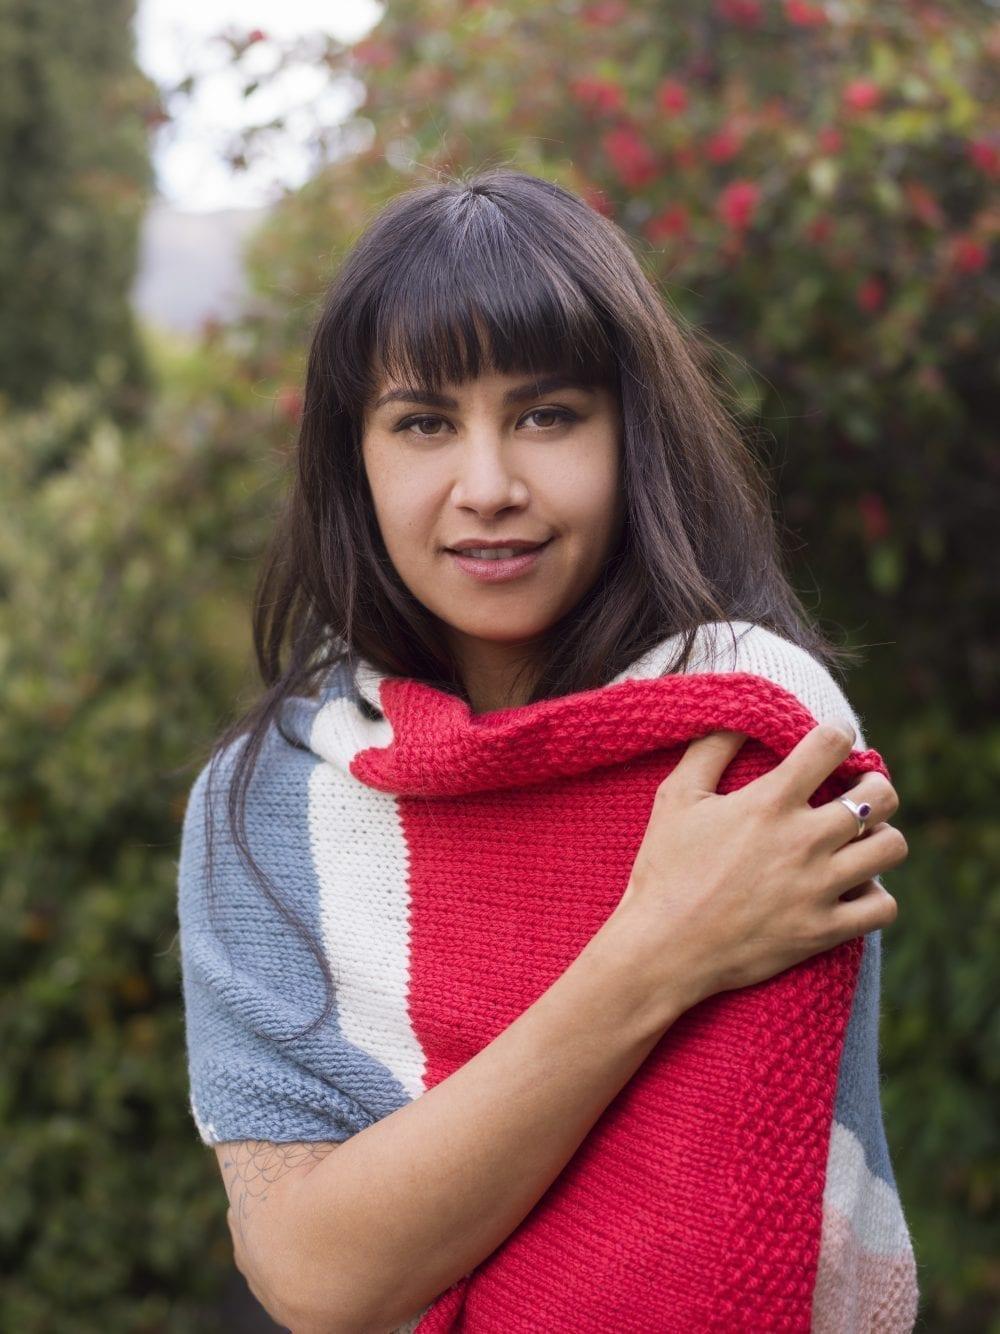 Jules Pashmina Knit Kit by The Woven Co